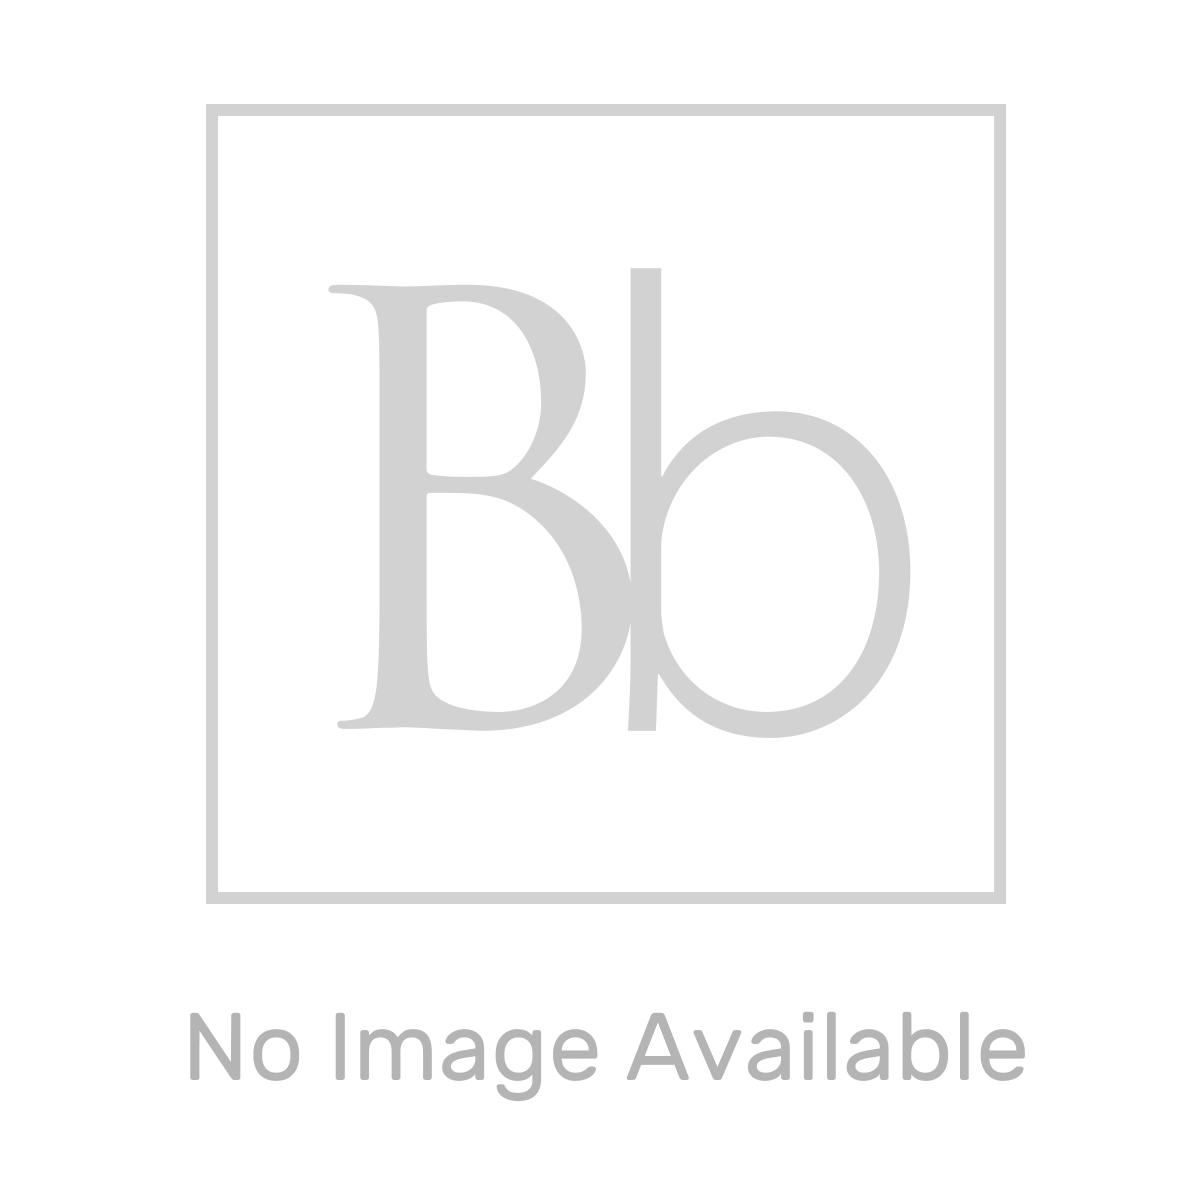 RAK Round Corner Double Soap Basket Measurements